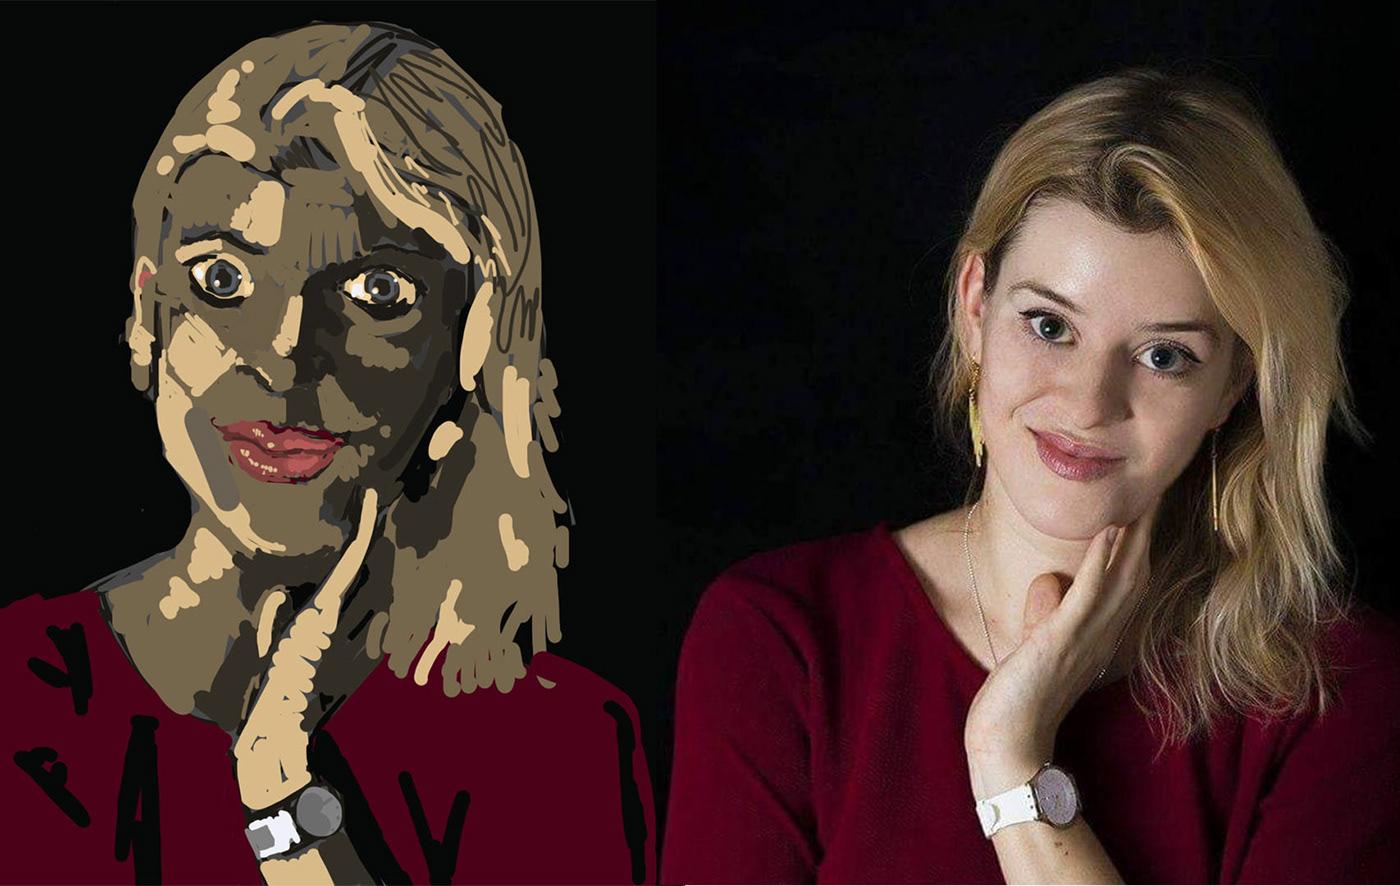 Image may contain: person, human face and cartoon